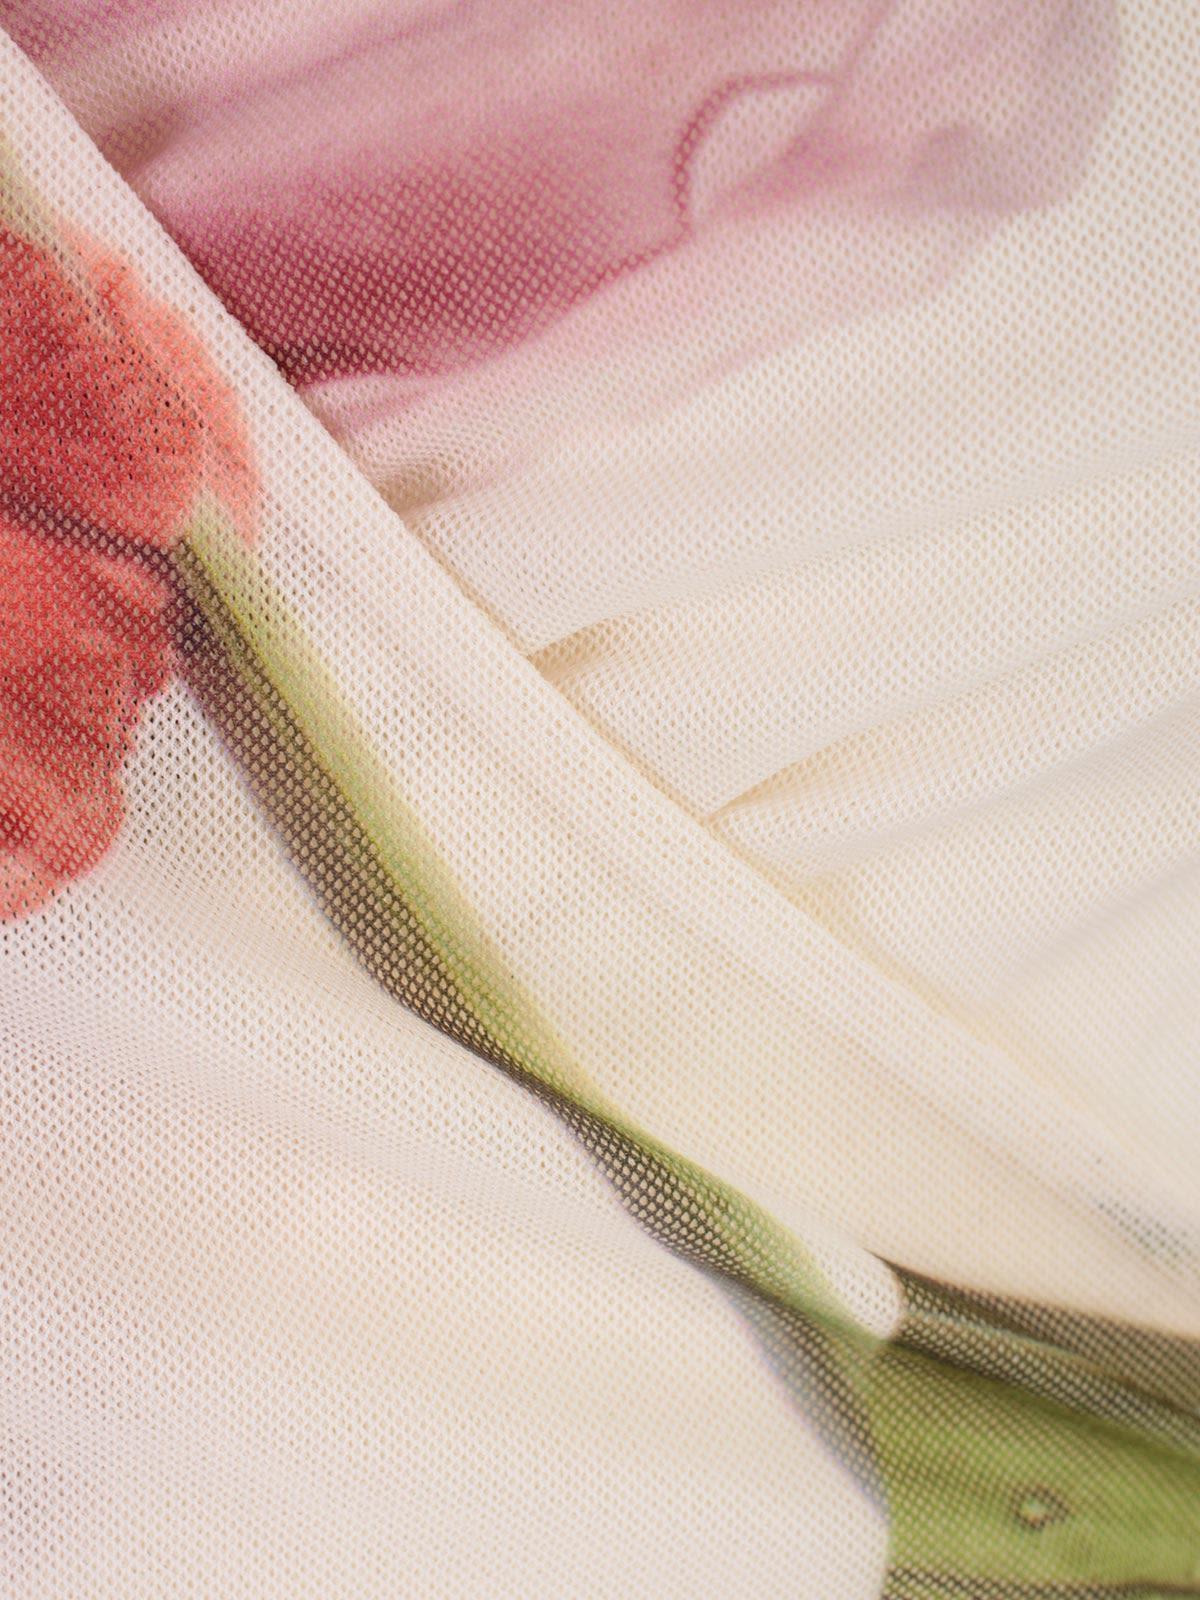 27894a0667 Ganni Ganni Floral Wrap Dress - Bright White - 10904792